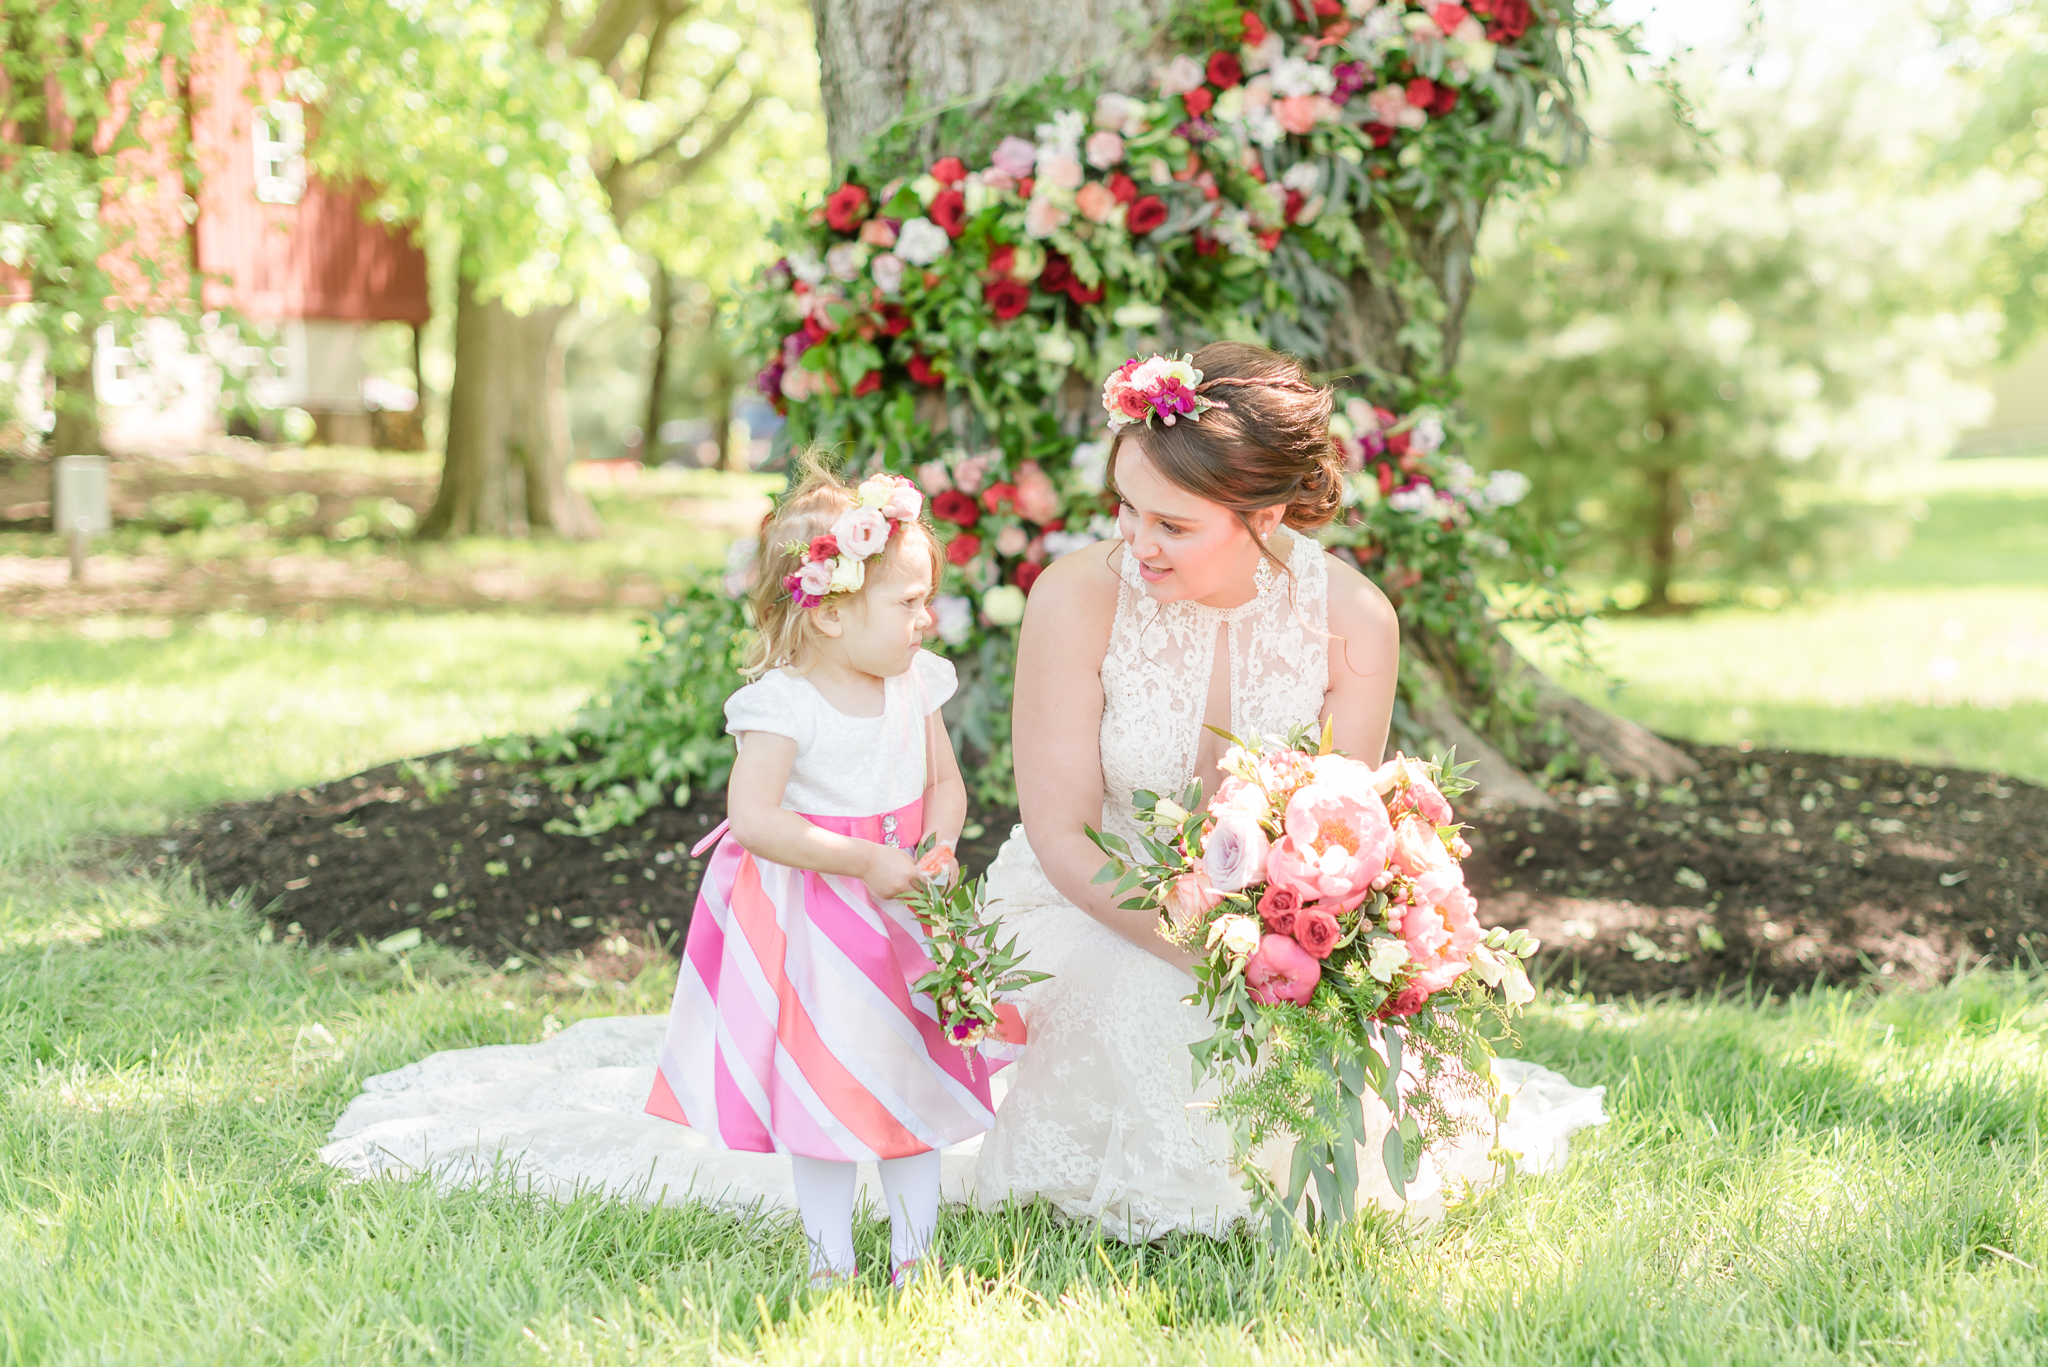 Mustard Seed Gardens Wedding Indianapolis Noblesvile Fishers Wedding Photographer-38.jpg